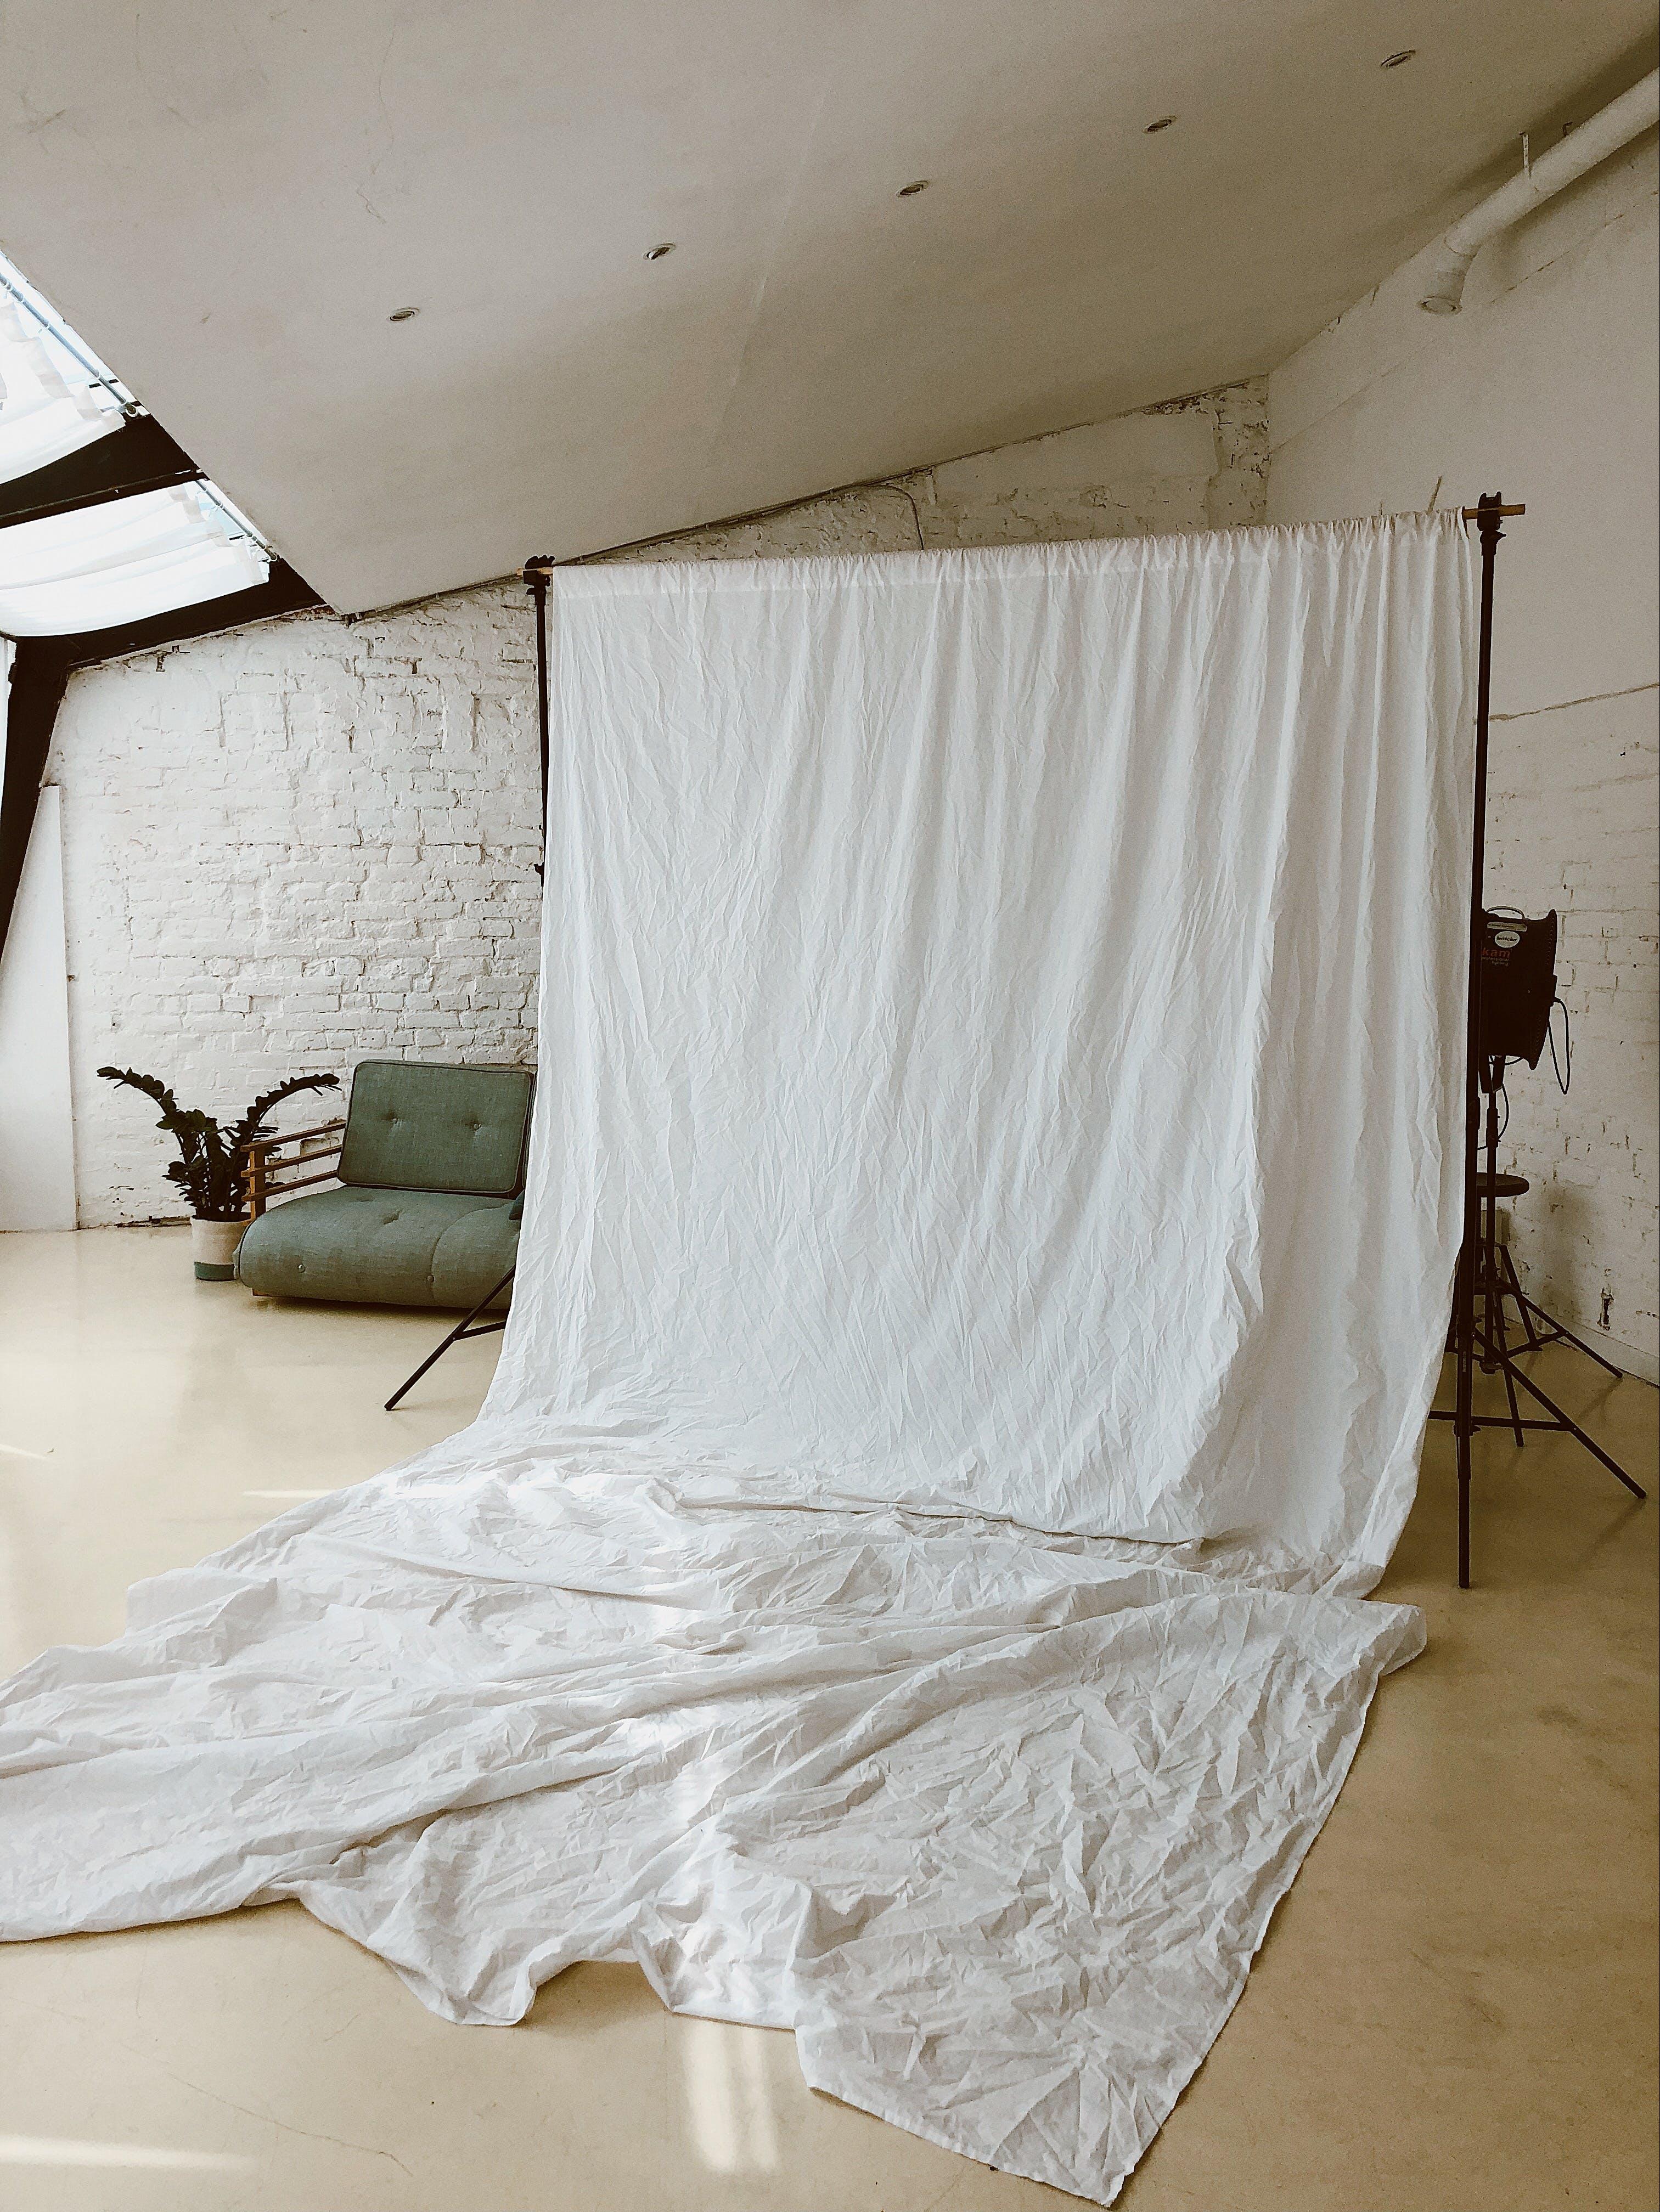 Kostnadsfri bild av design, fotostudio, inne, lägenhet